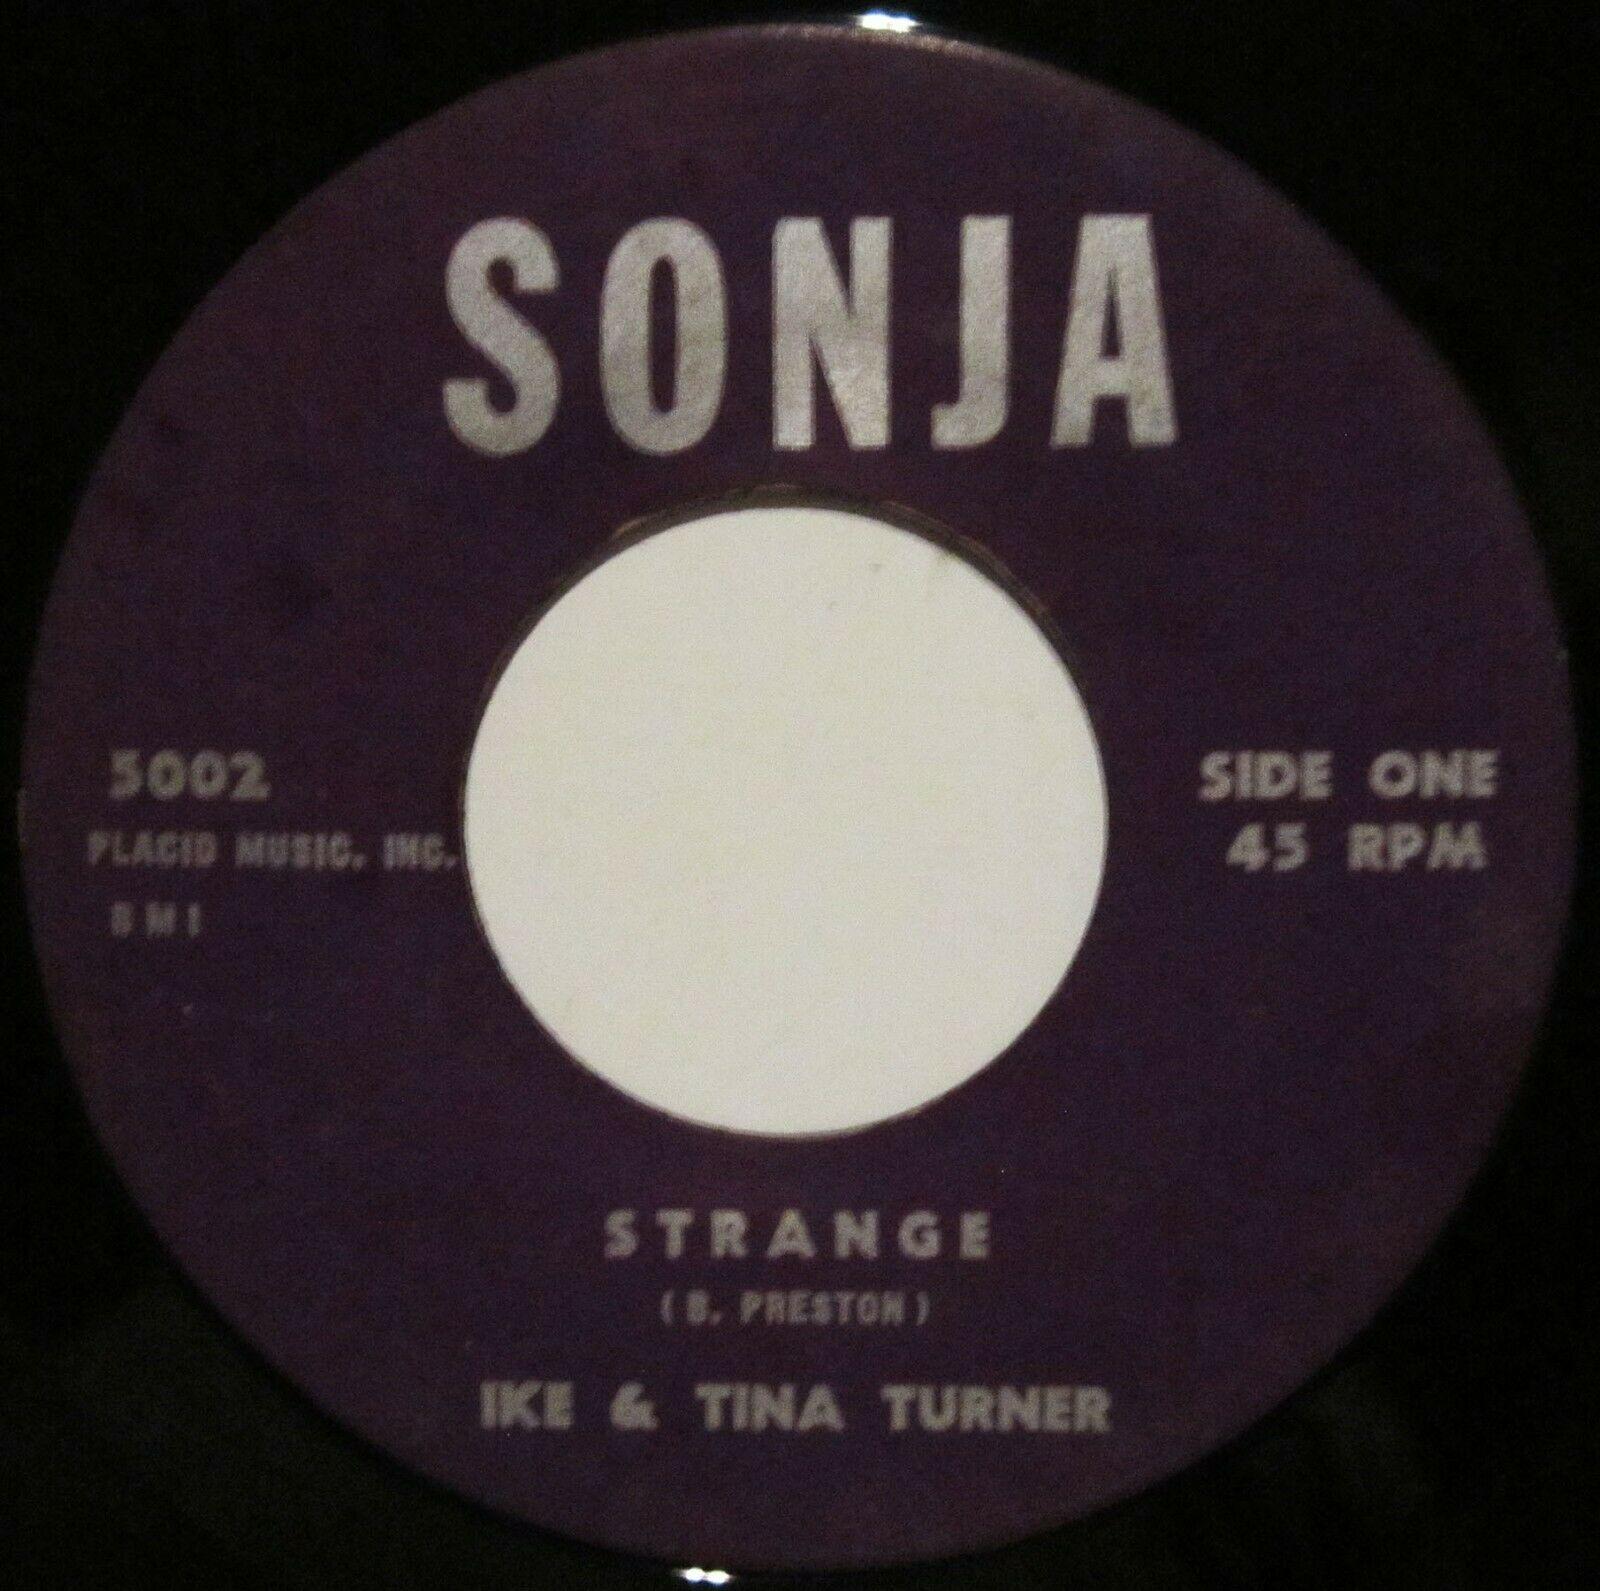 Ike   Tina Turner  Strange  RARE Northern Soul 45 on Sonja